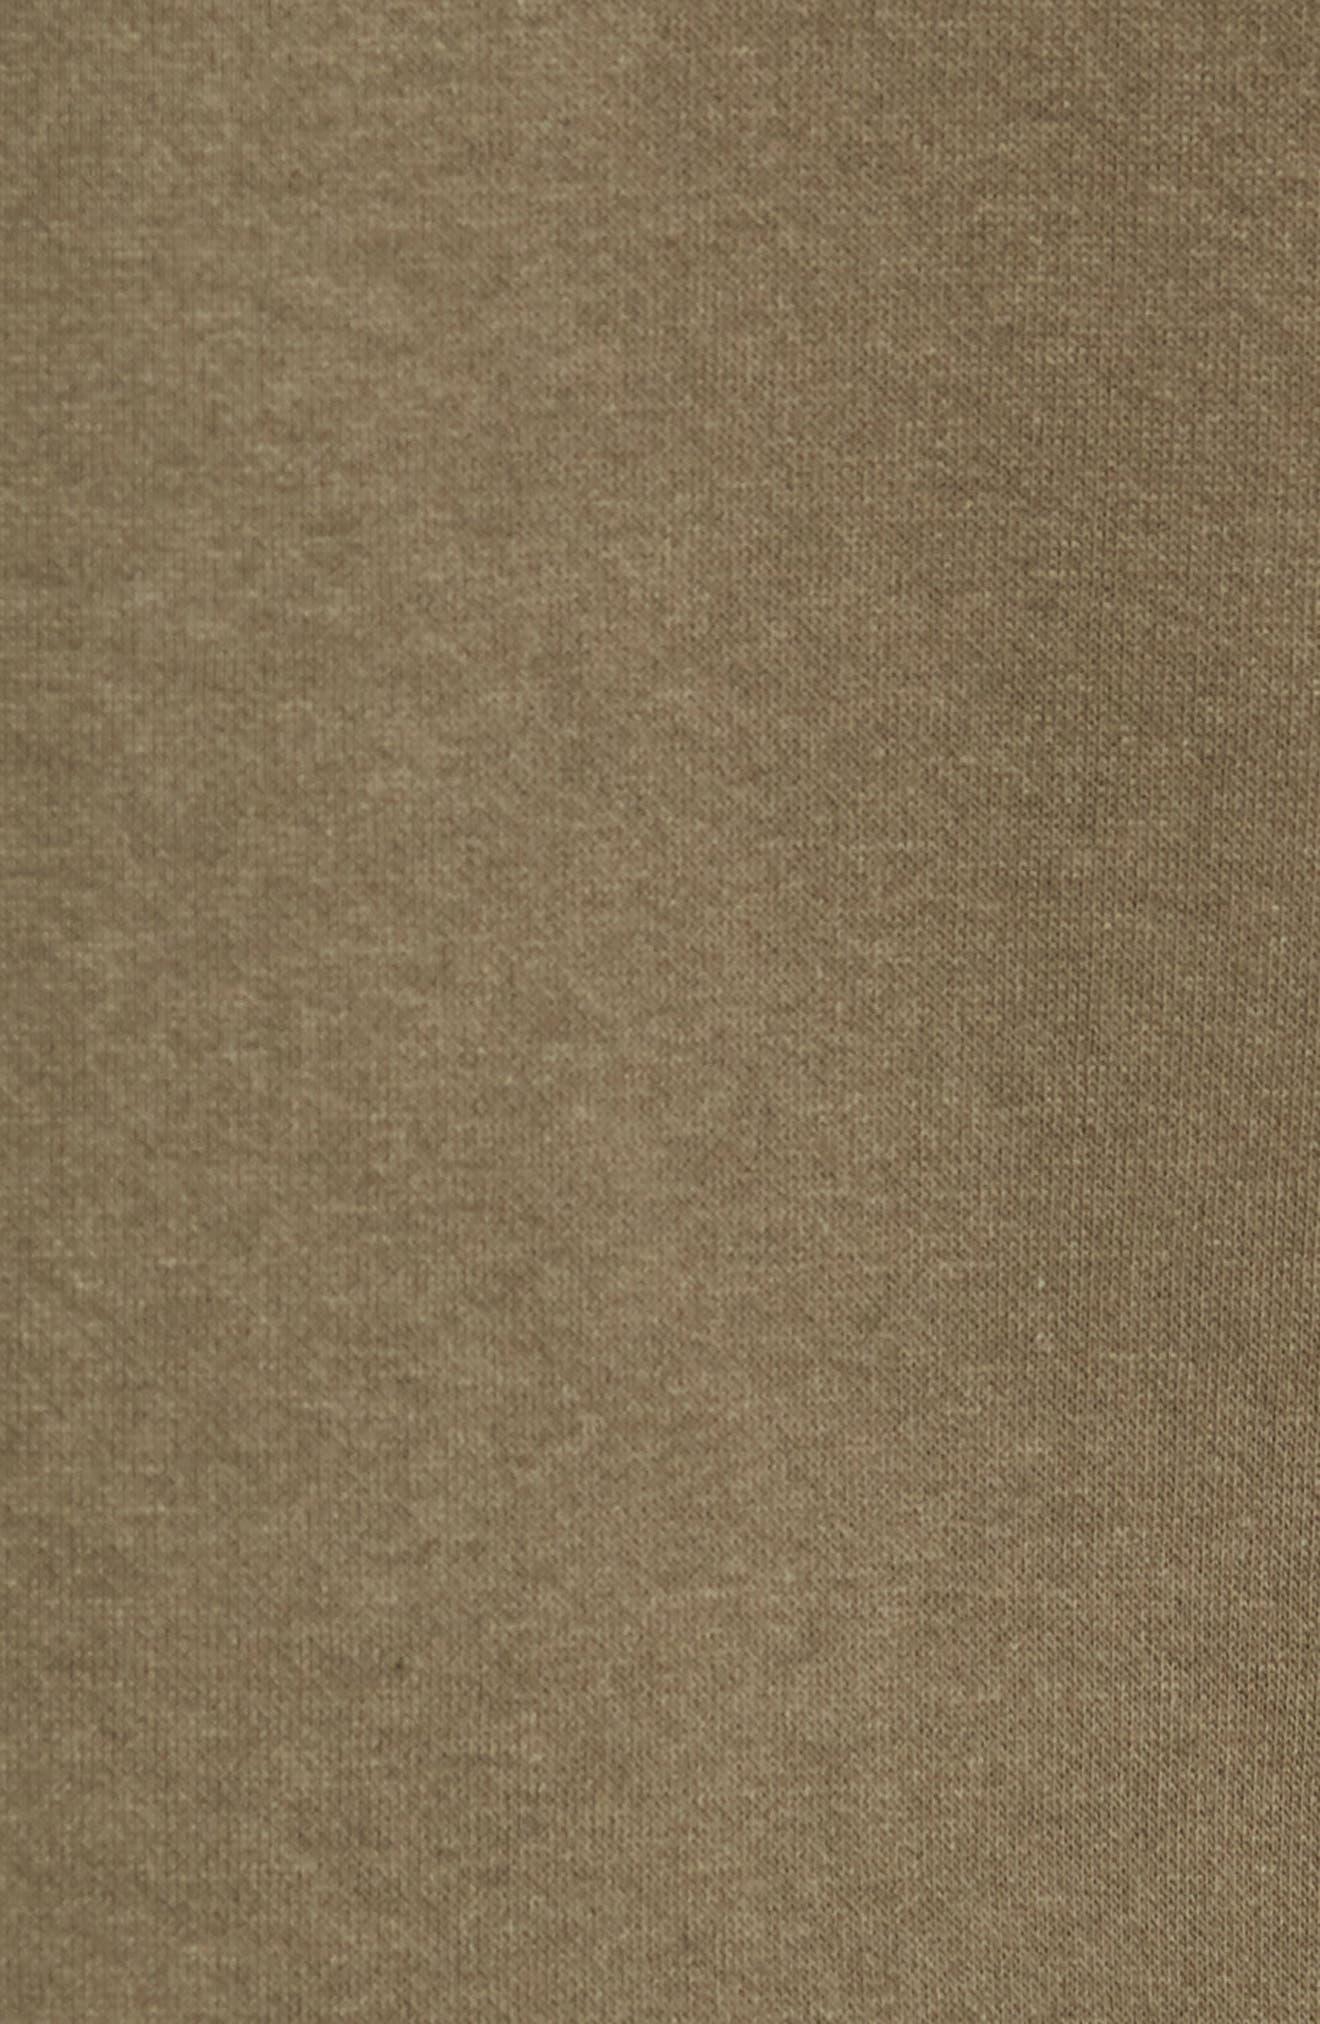 Trim Fit Long Sleeve Pocket T-Shirt,                             Alternate thumbnail 5, color,                             OLIVE